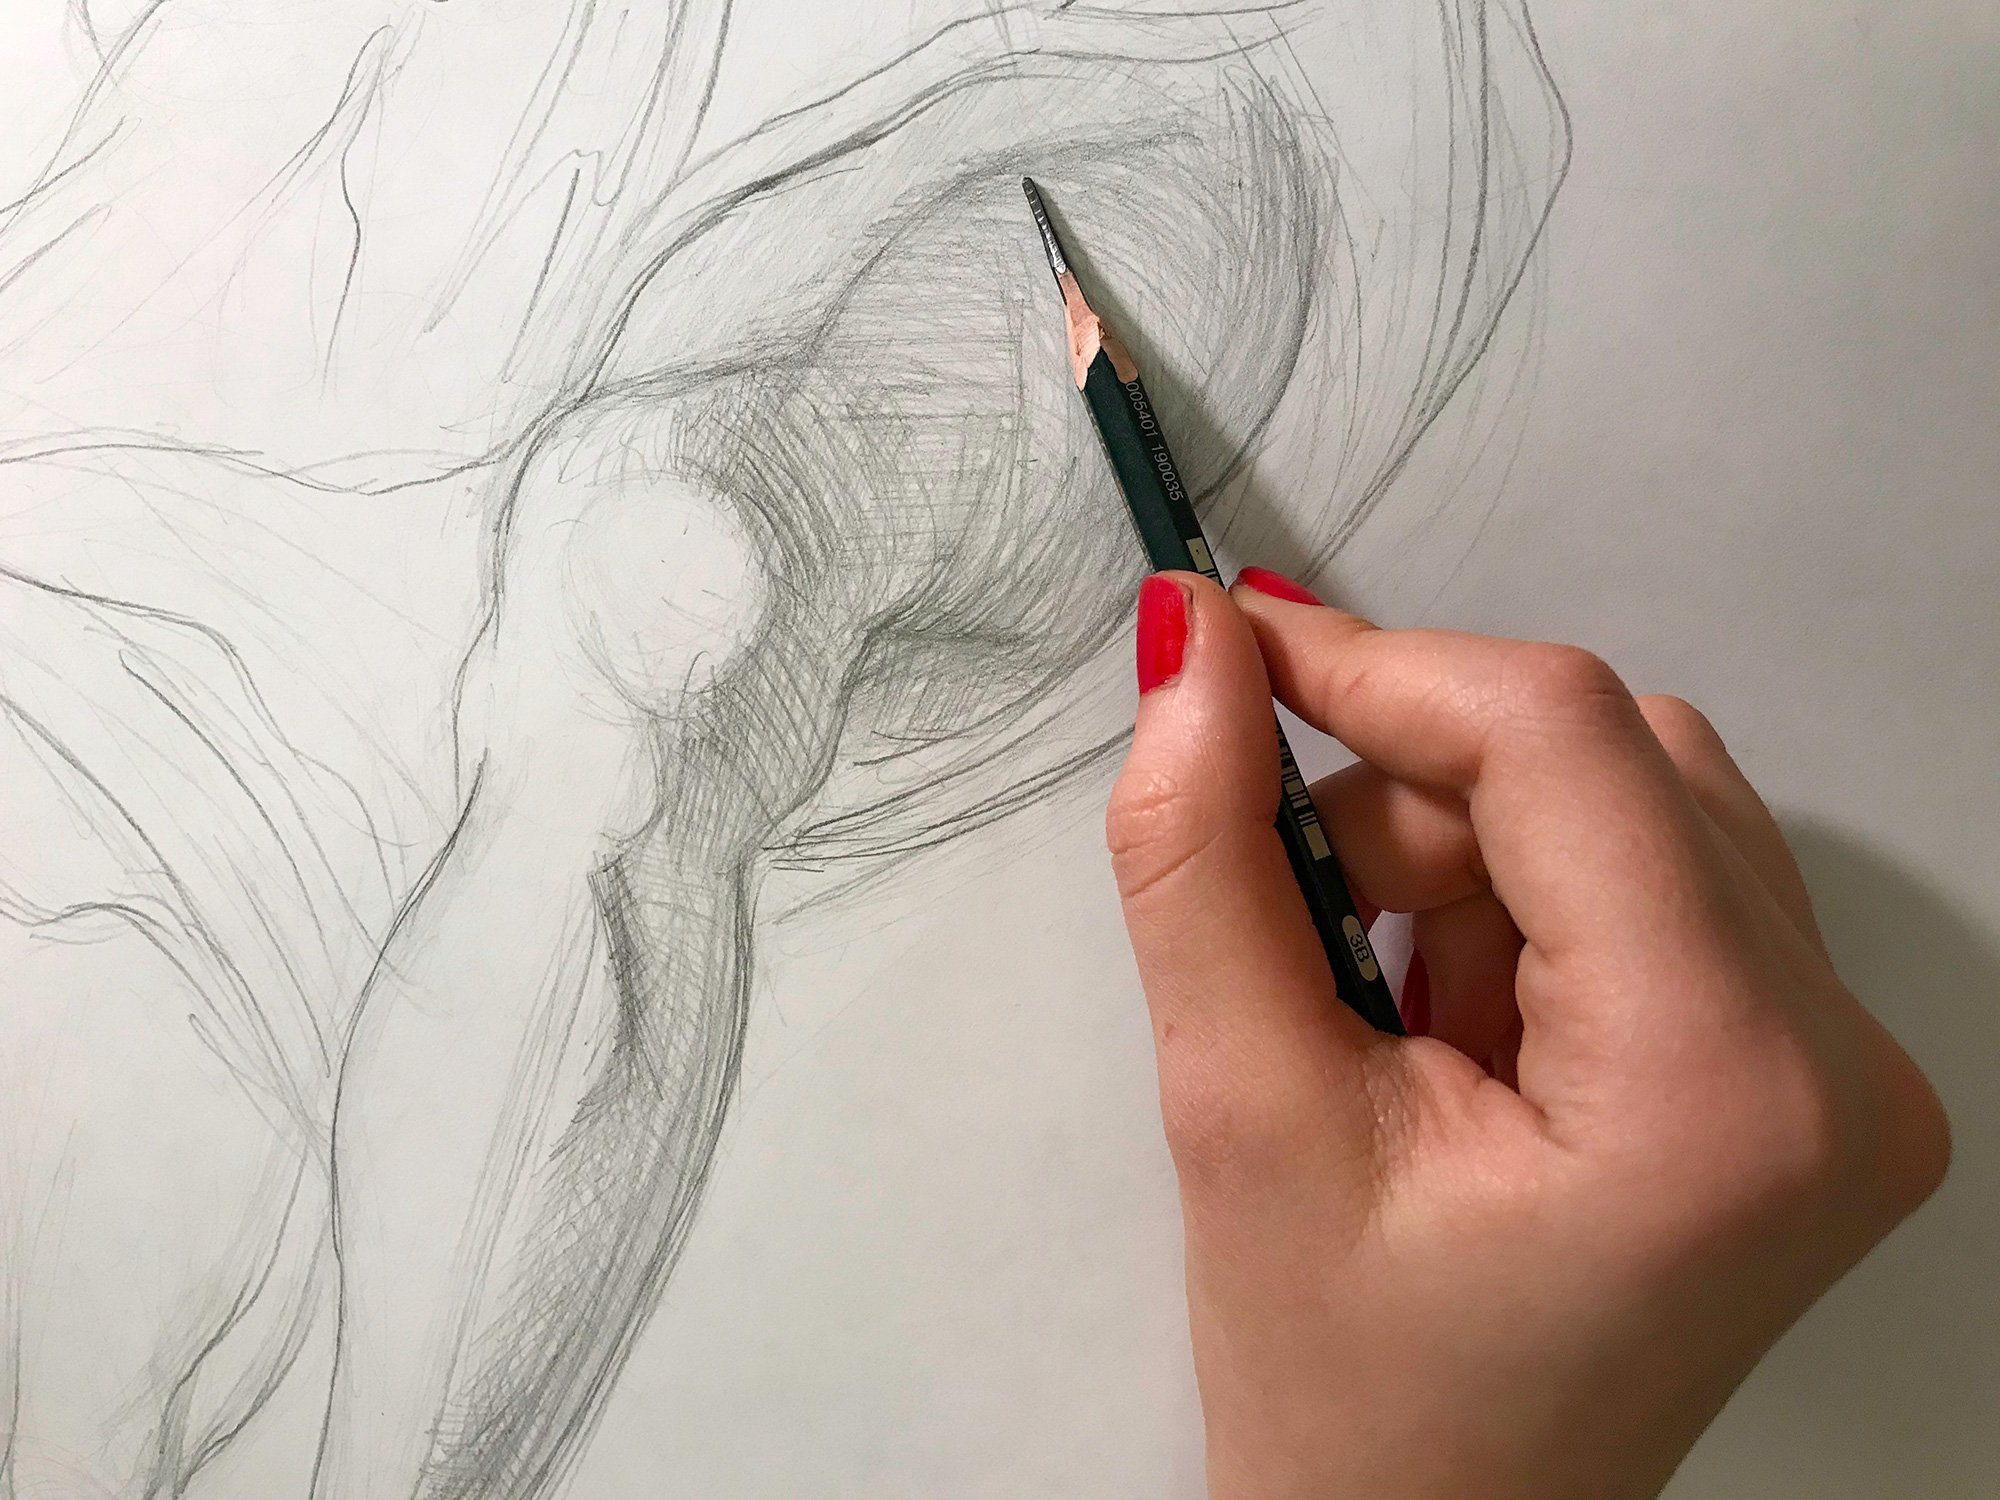 yardley-arts-drawing-courses-northamptonshire.jpg